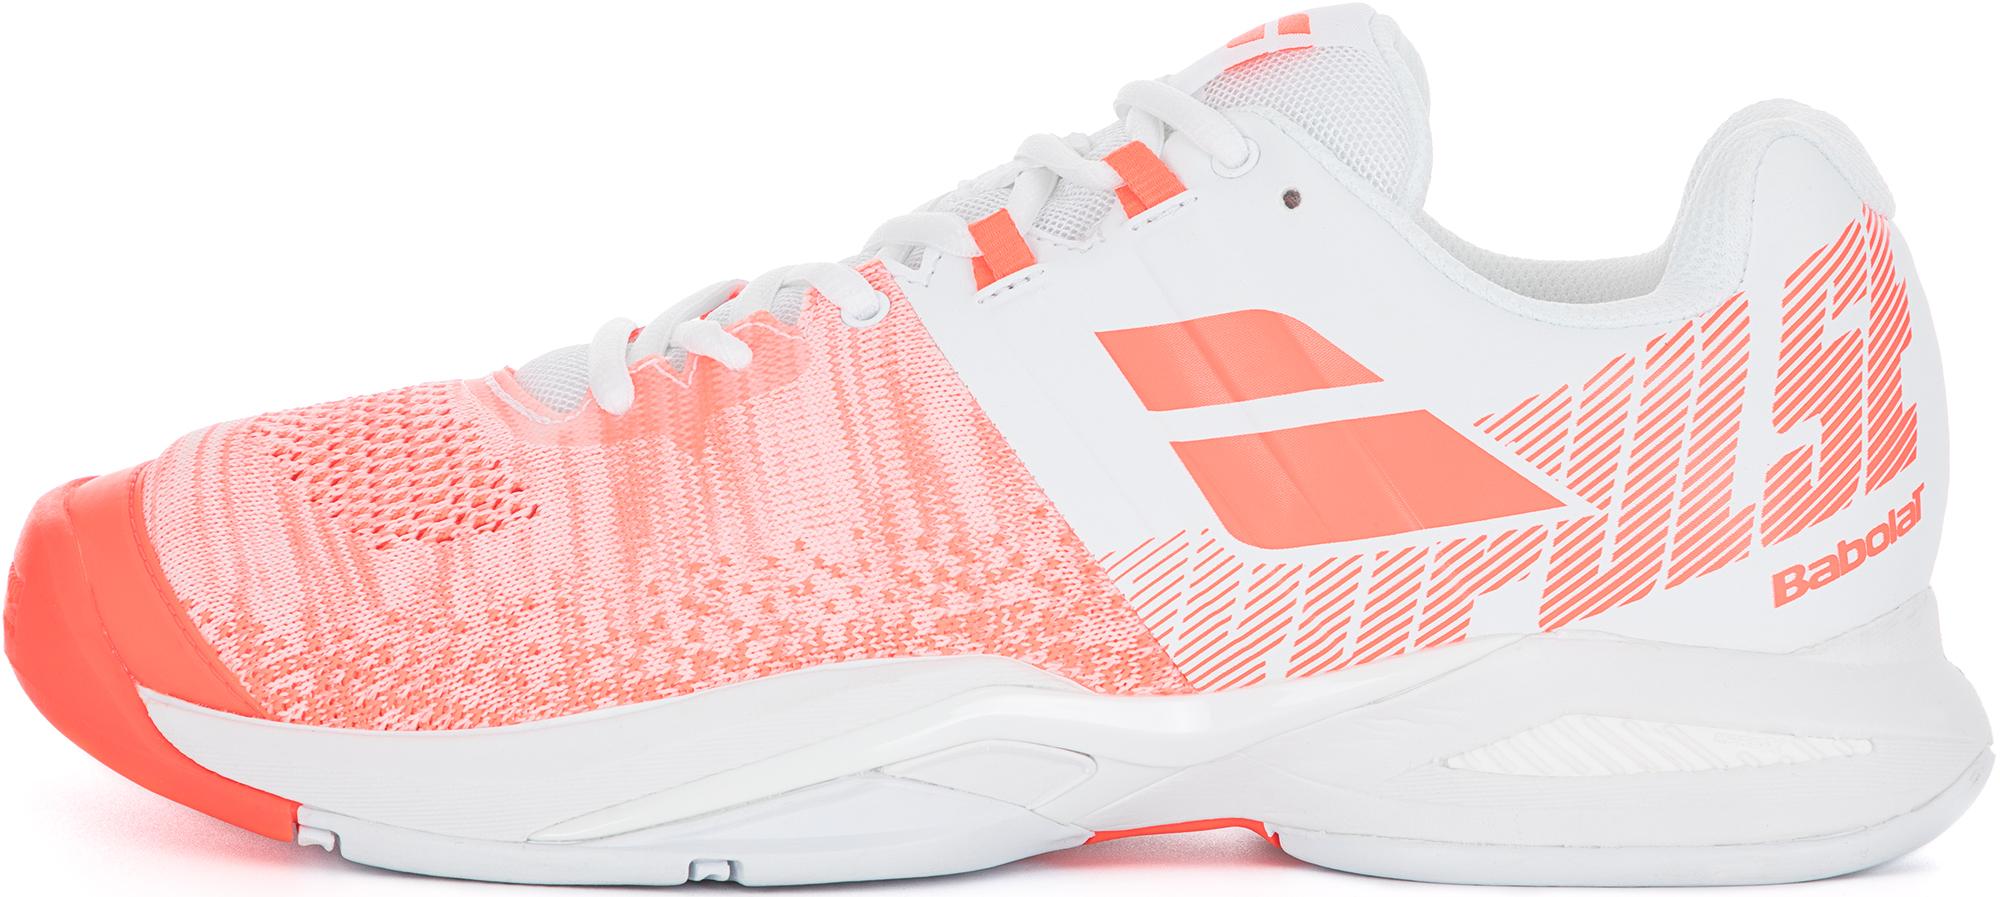 Babolat Кроссовки женские Babolat Propulse Blast All Court, размер 39 кроссовки мужские adidas all court цвет белый bb9926 размер 7 39